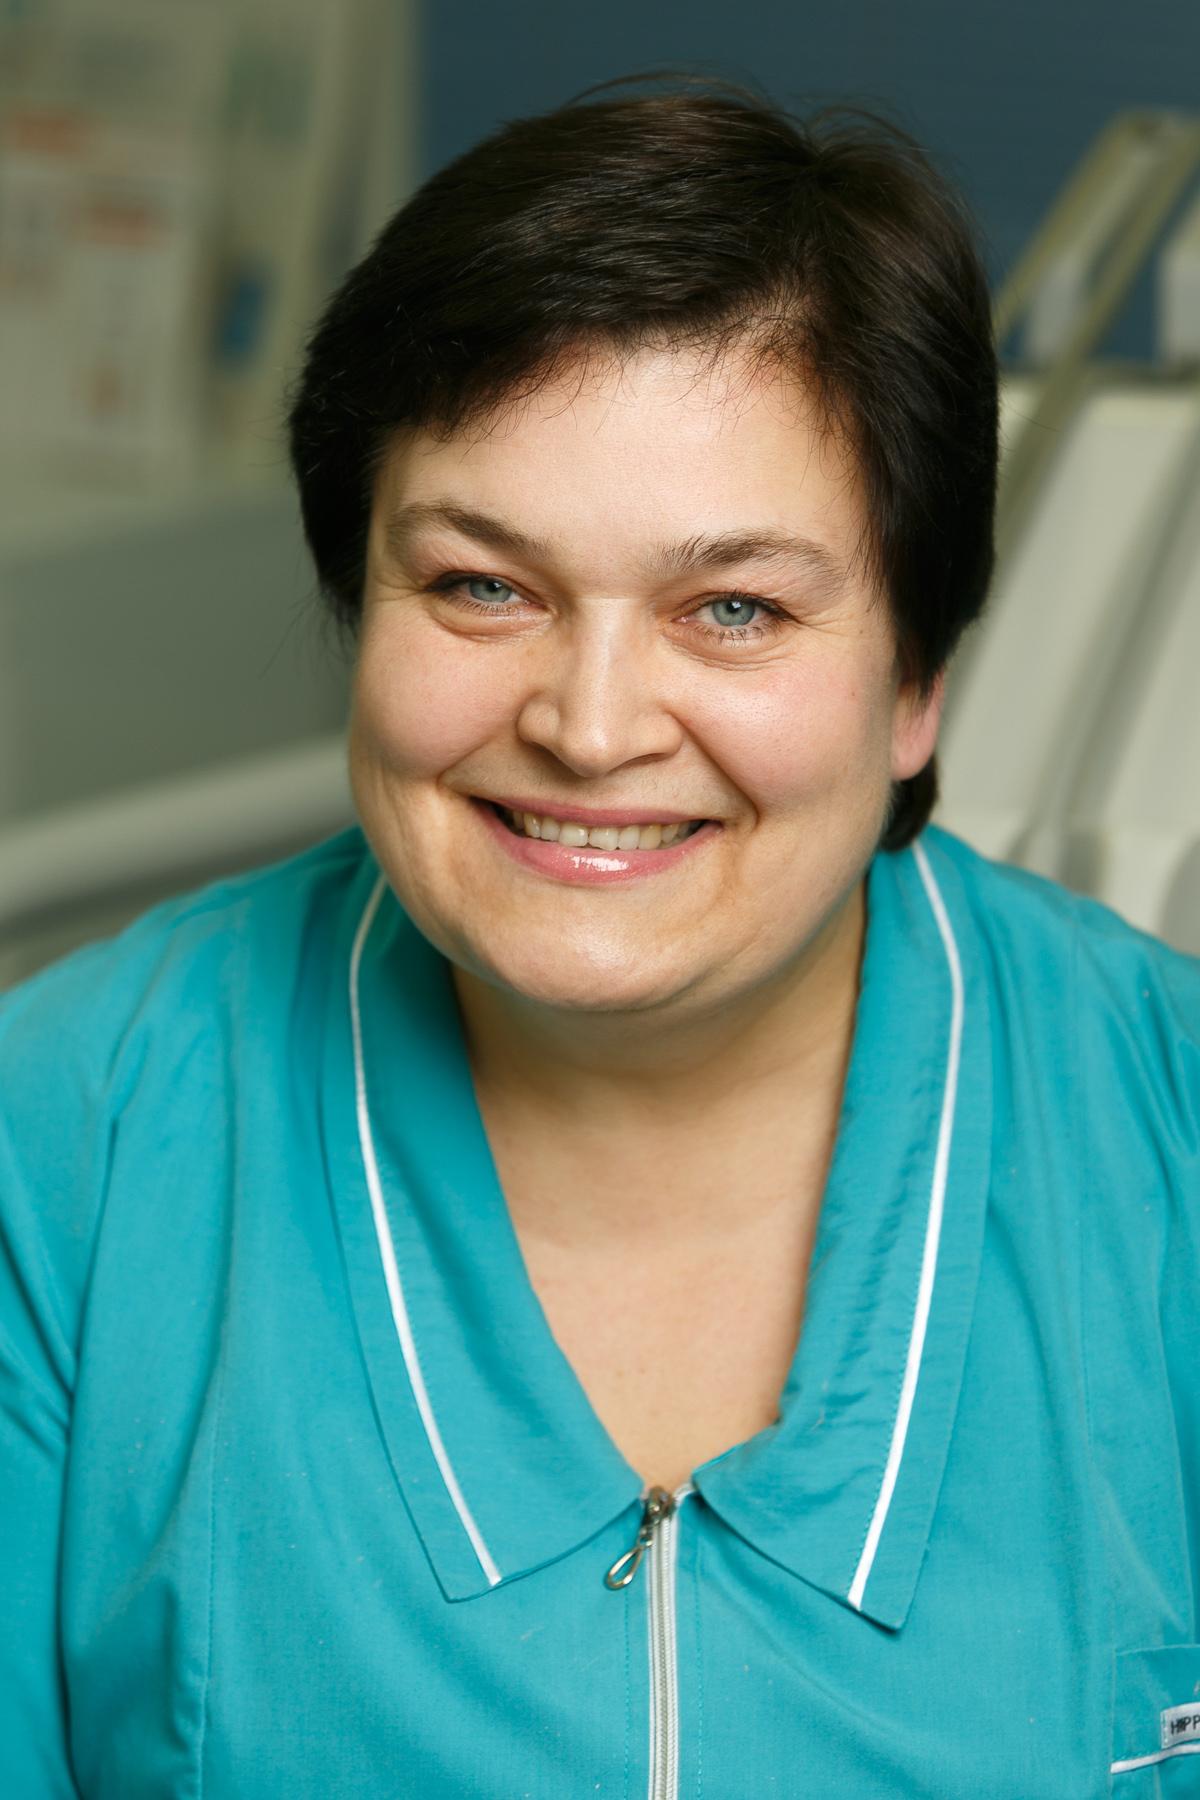 Степанова Наталья Борисовна